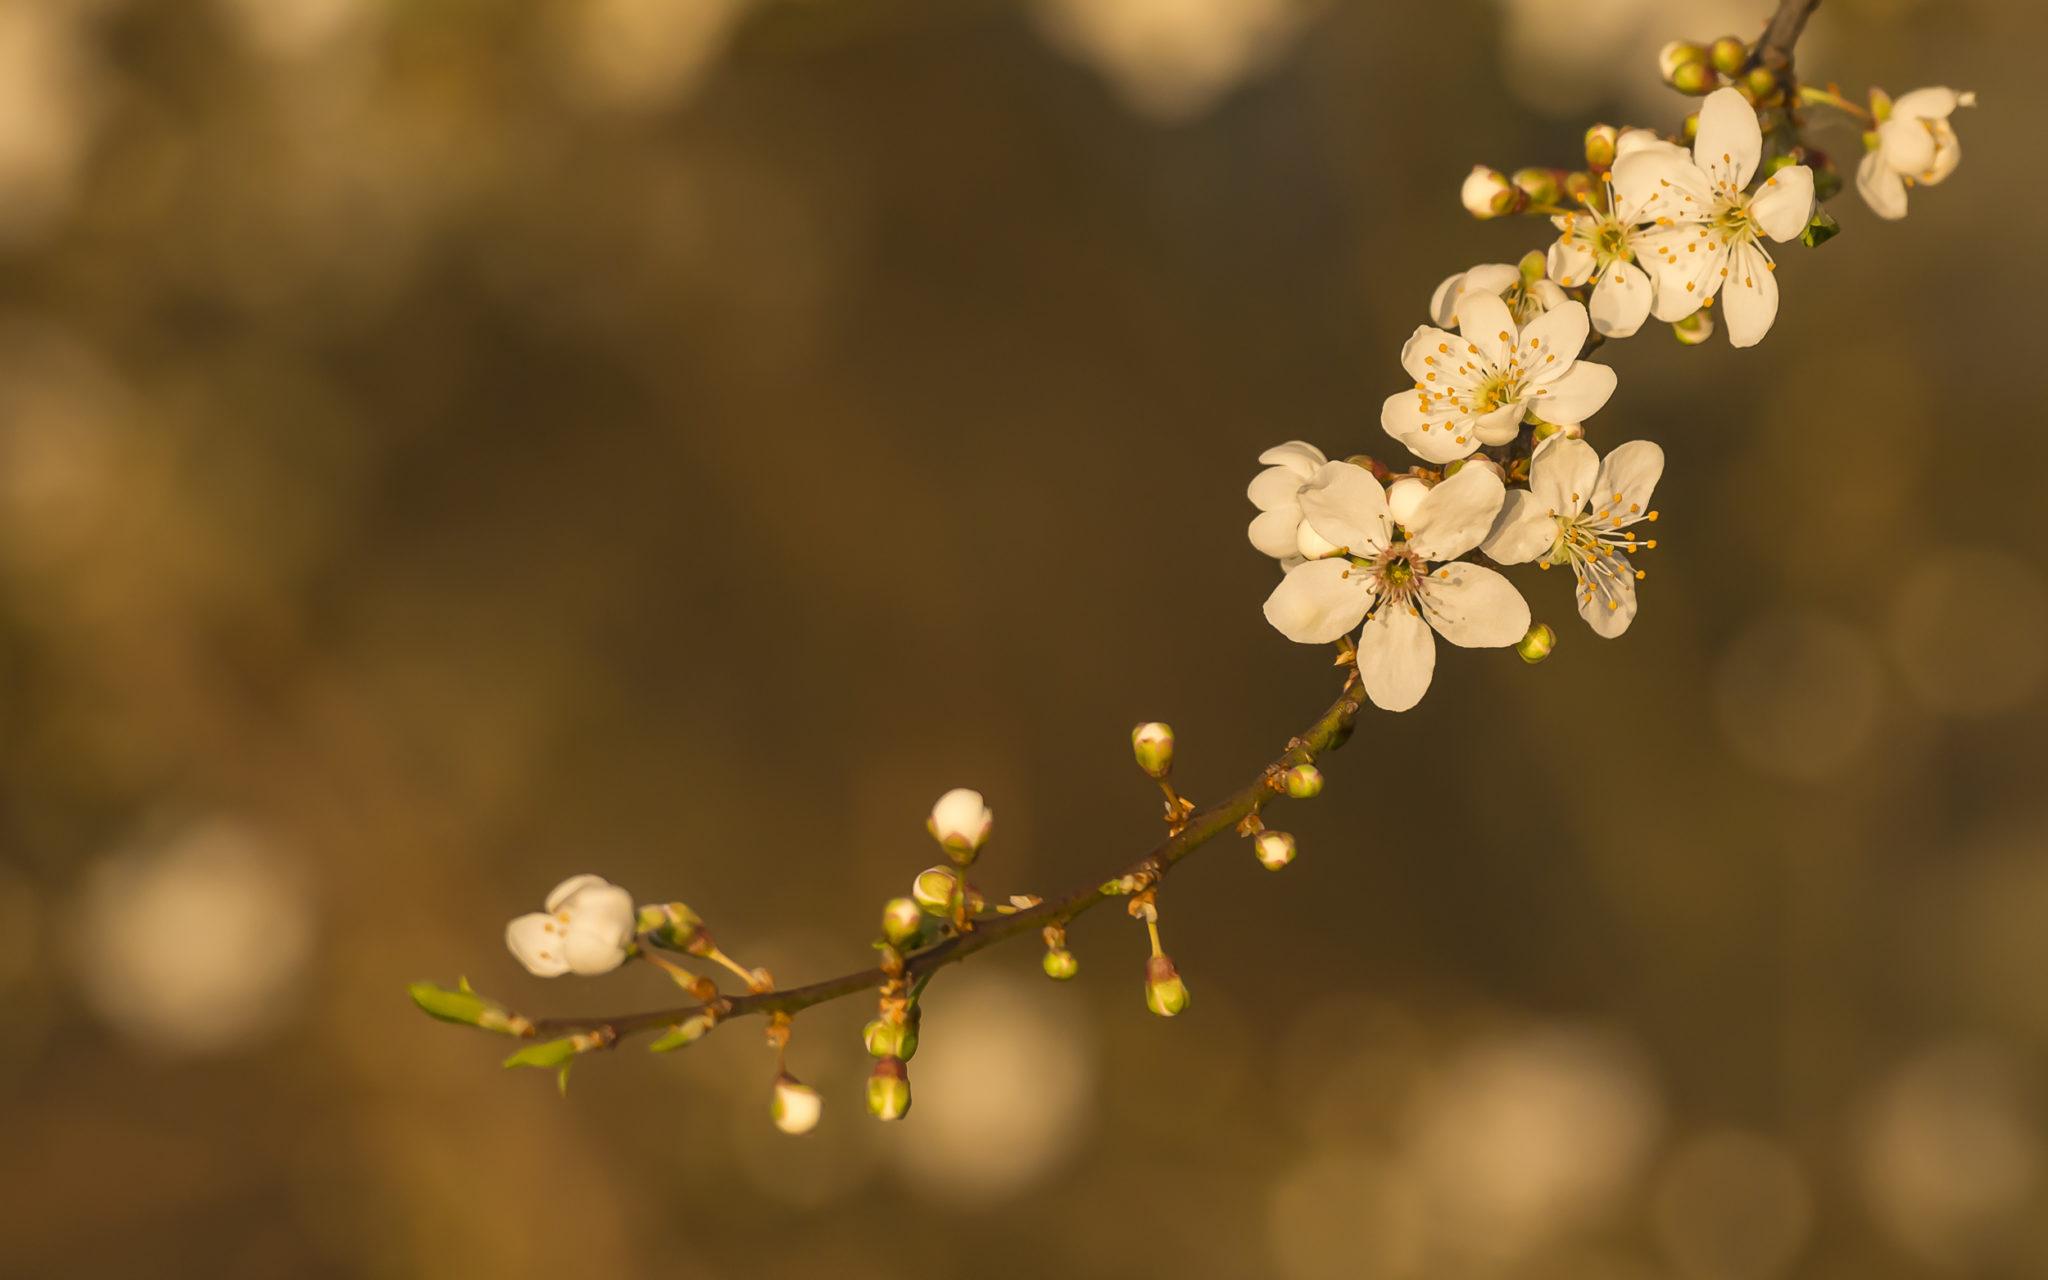 Naturfotografie Olaf & Sylvia Rentzsch, blüte, Frühling